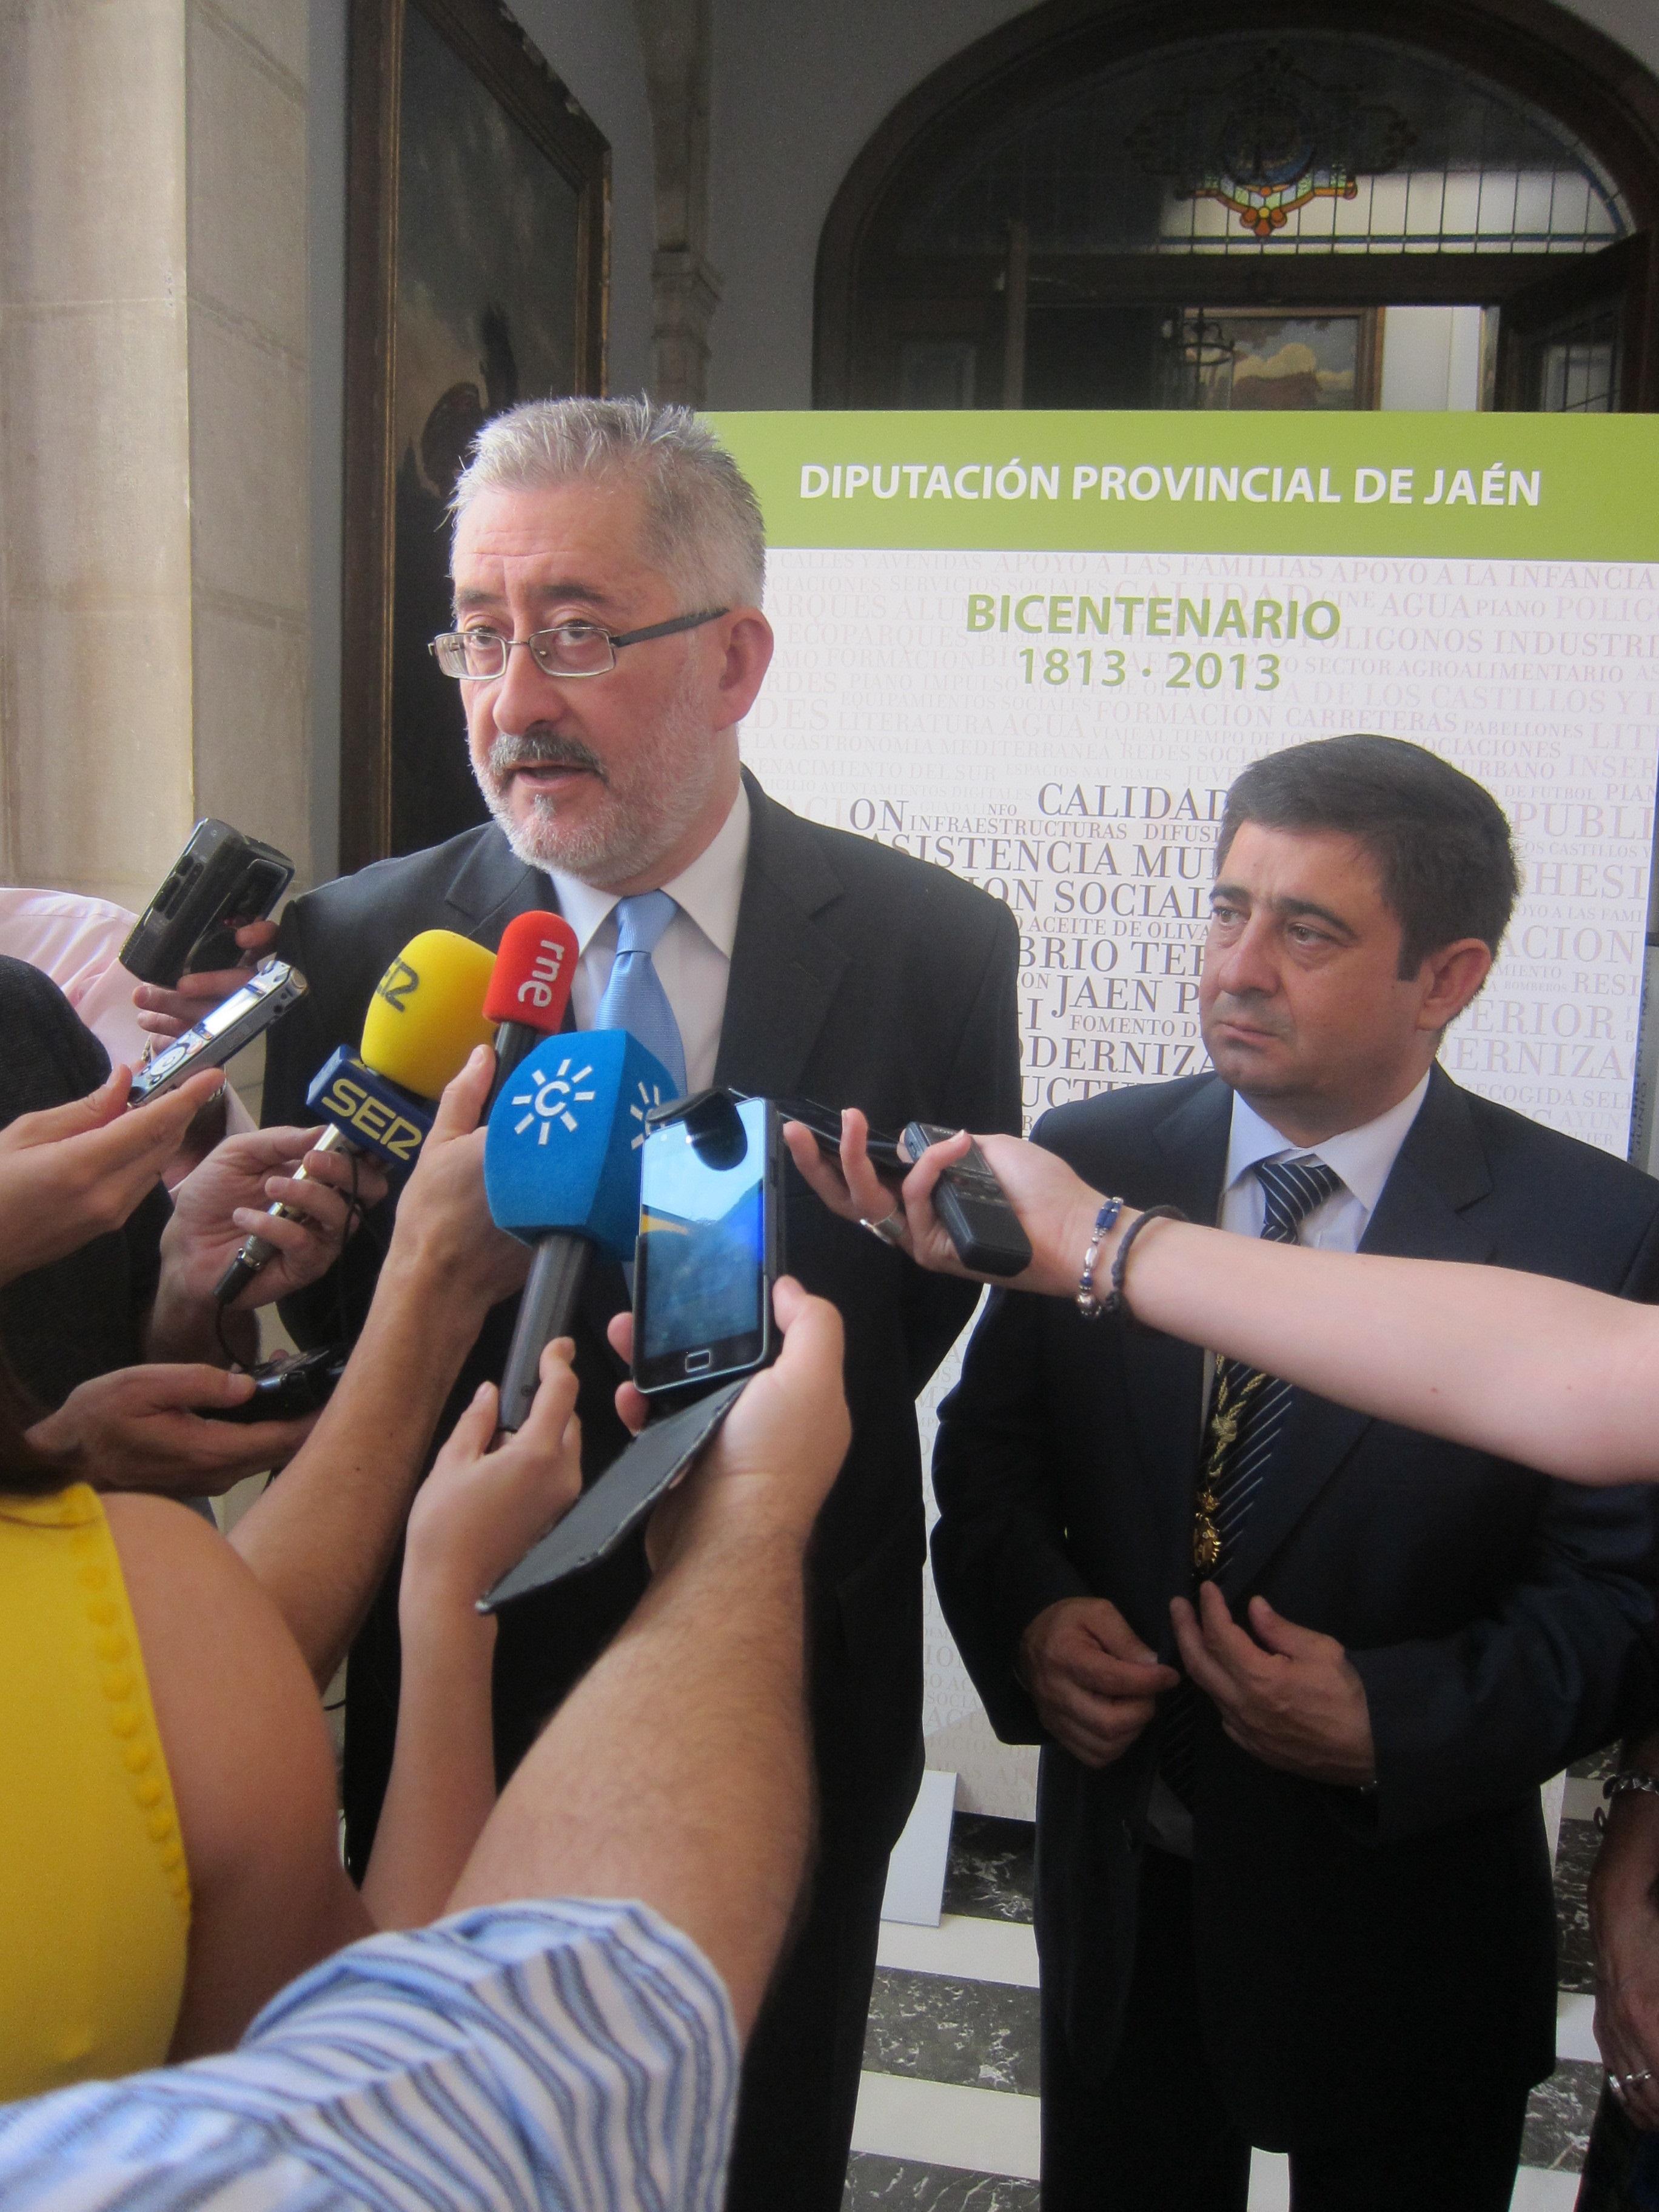 Ávila asegura que Griñán «va a seguir ejerciendo sin ninguna duda» como presidente e insta a no preocuparse «de 2016»